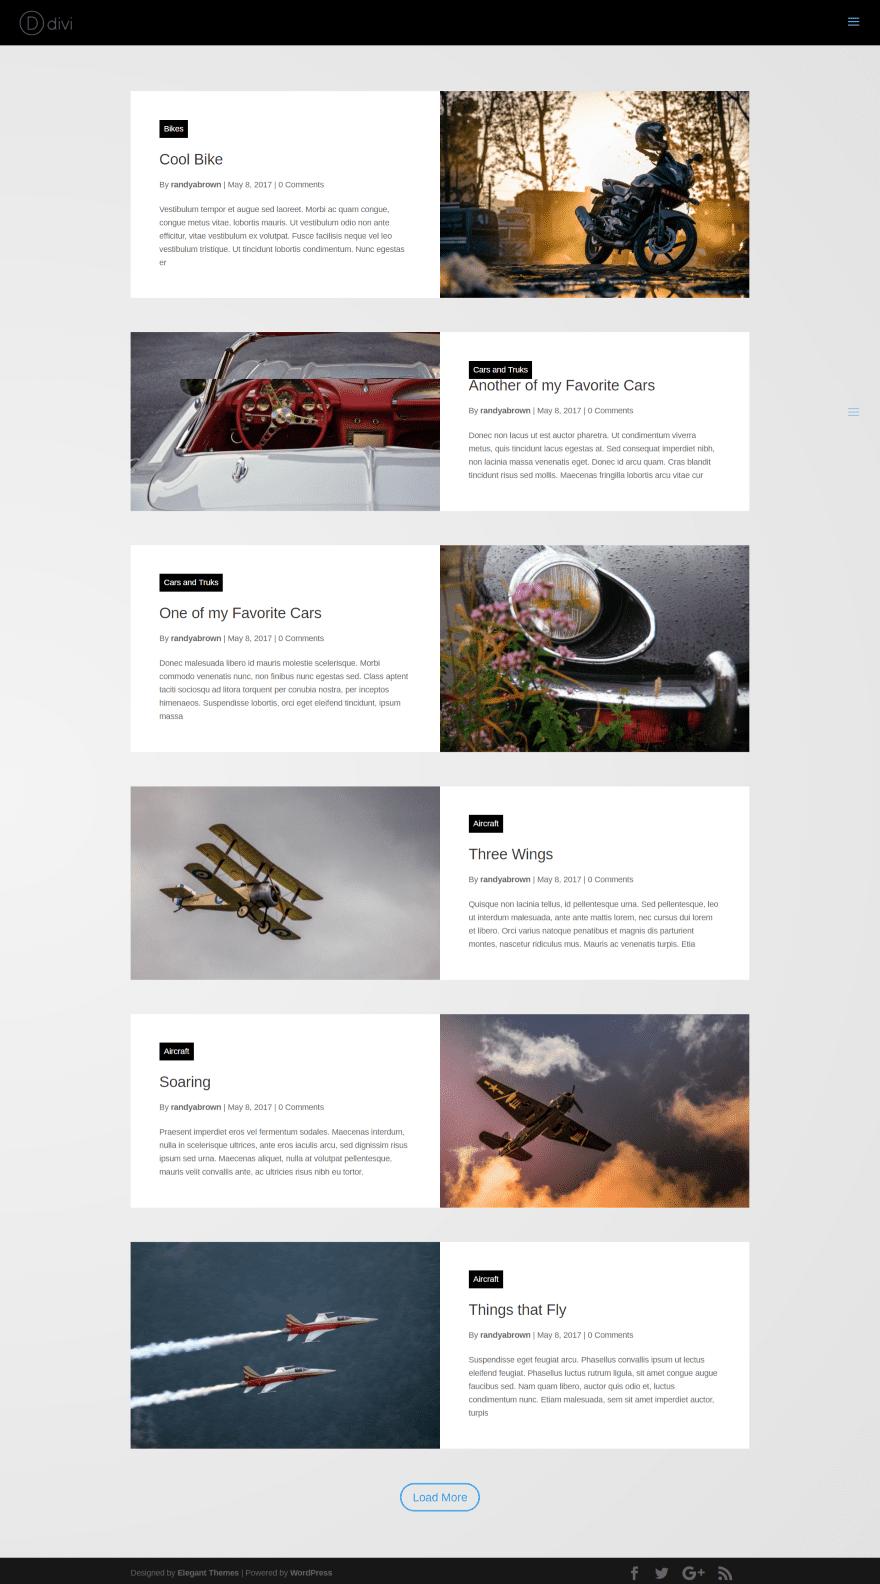 Divi Plugin Highlight – Divi Blog Extras | Elegant Themes Blog